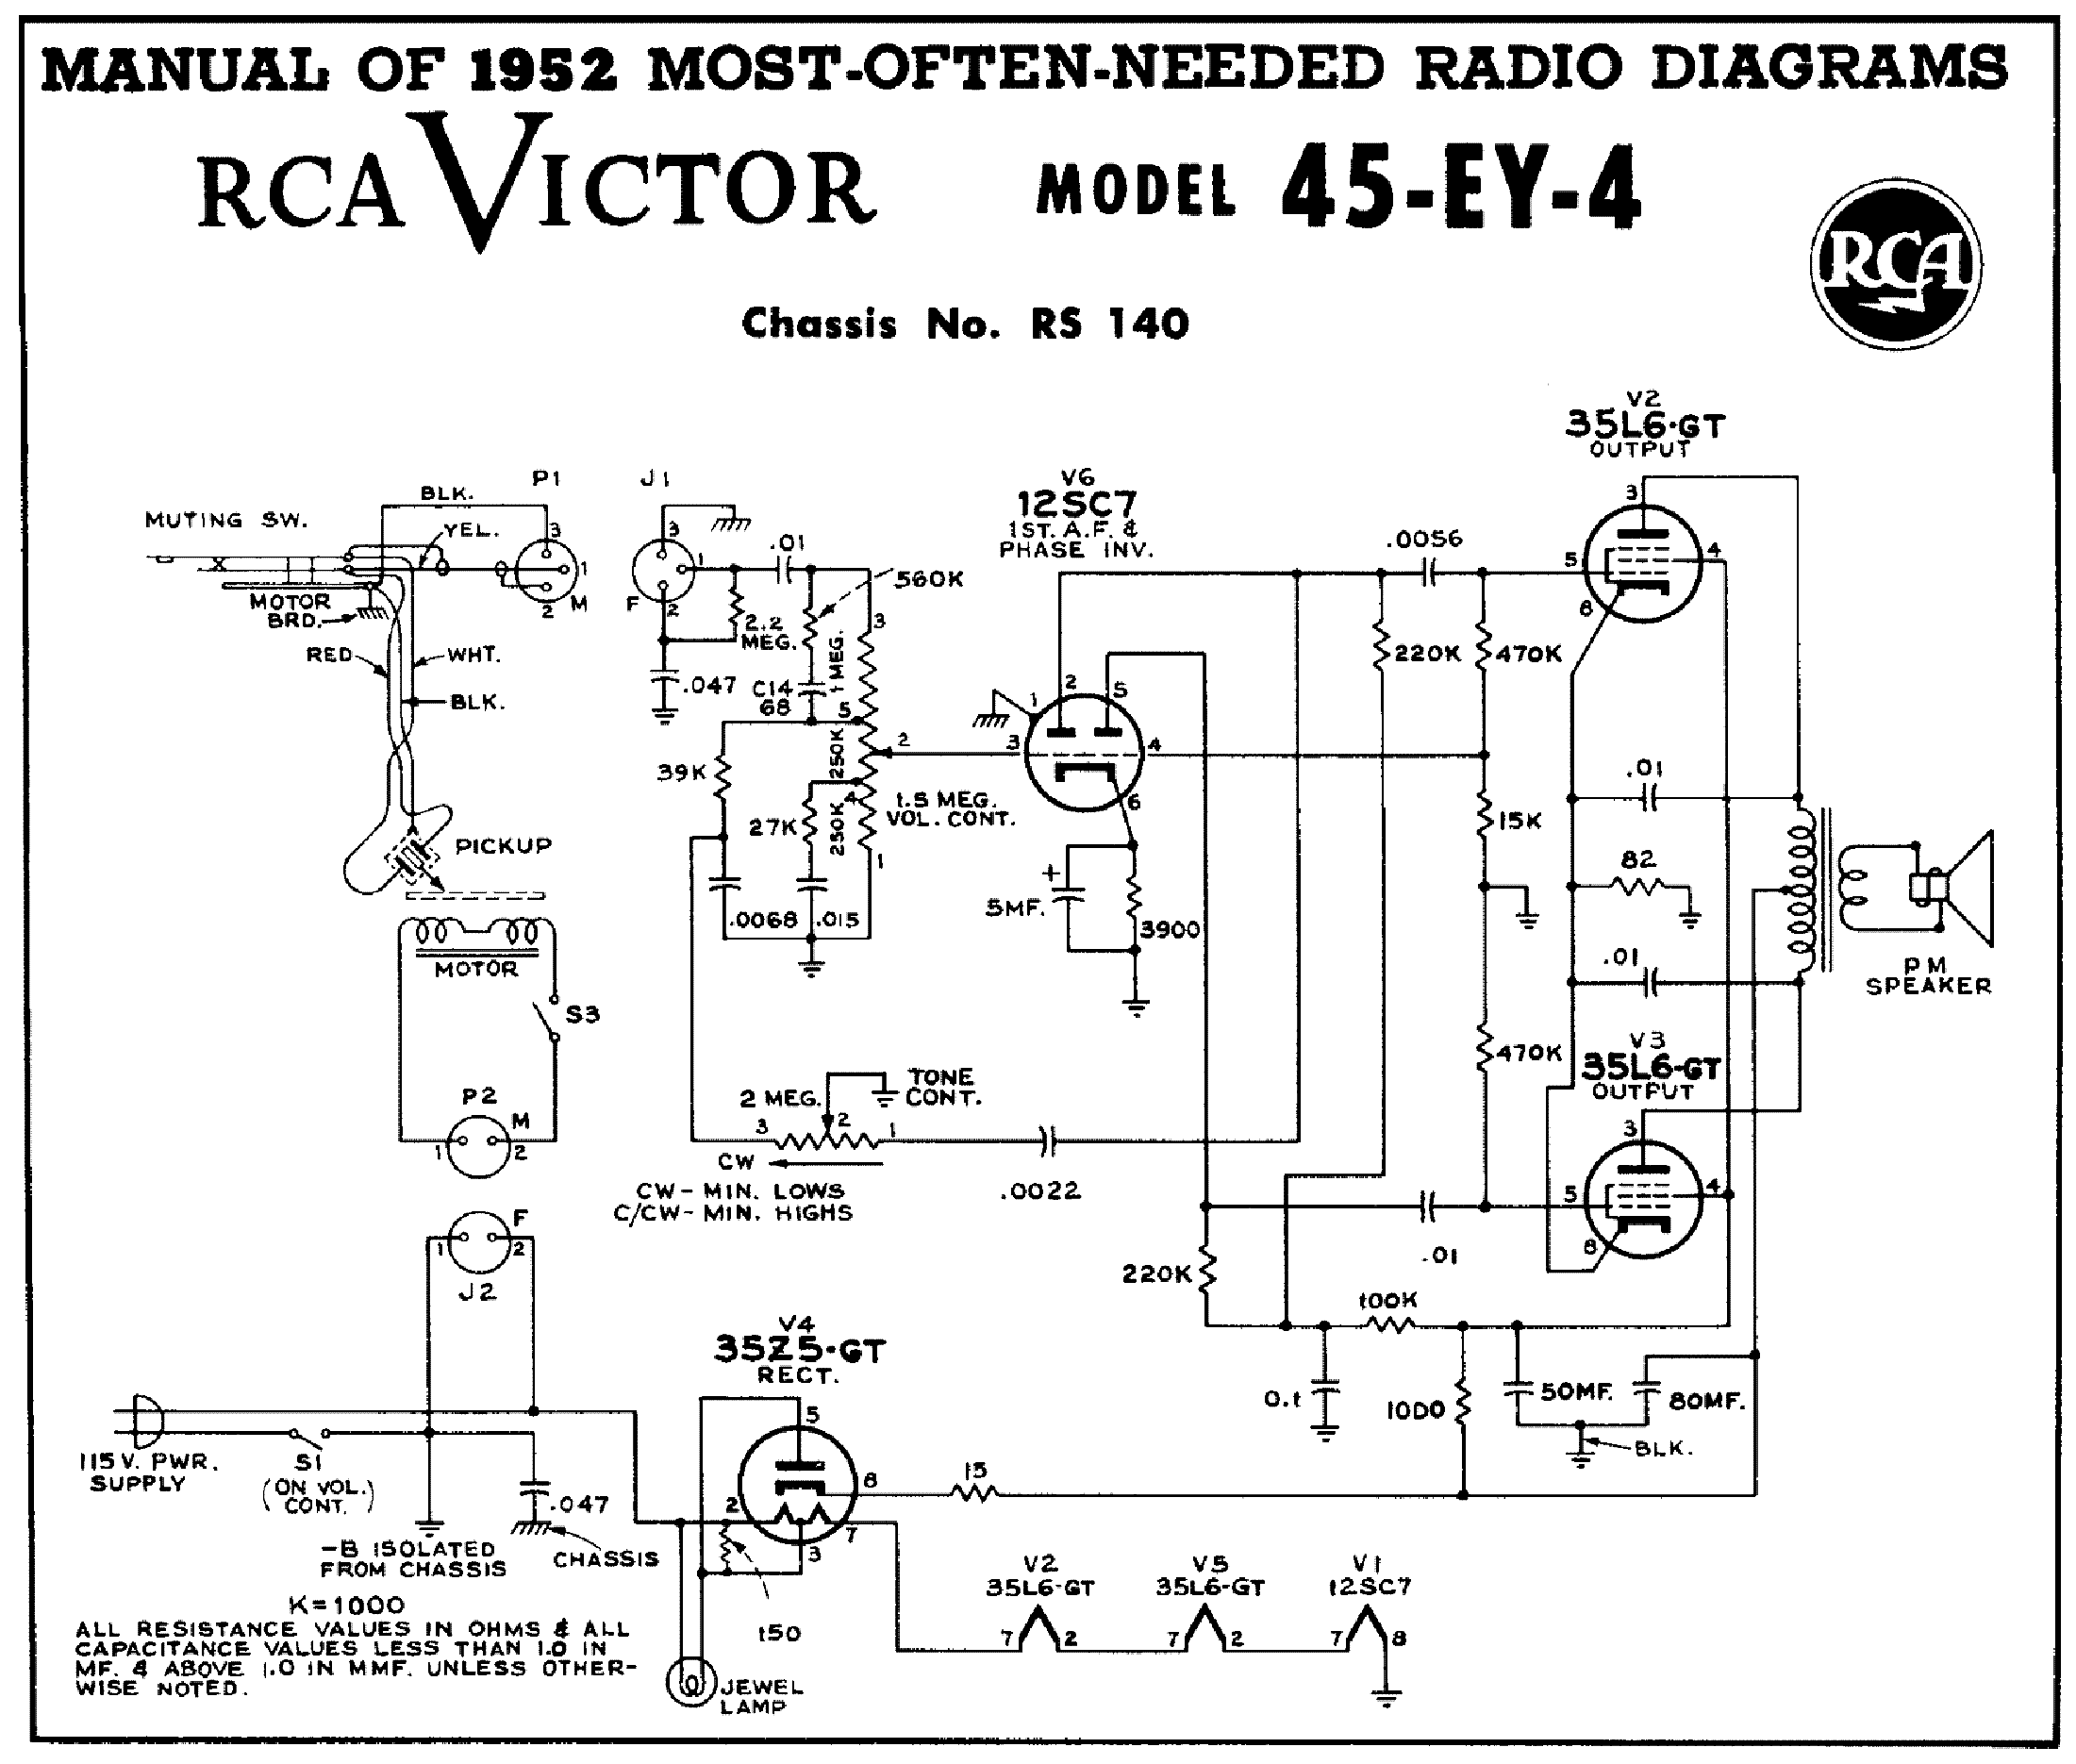 rca 45ey4 2x35l6 gt record player sch service manual download rh elektrotanya com 1963 RCA Stereo Amplifier Schematic Service Manuals Schematics RCA AFC 0.95L